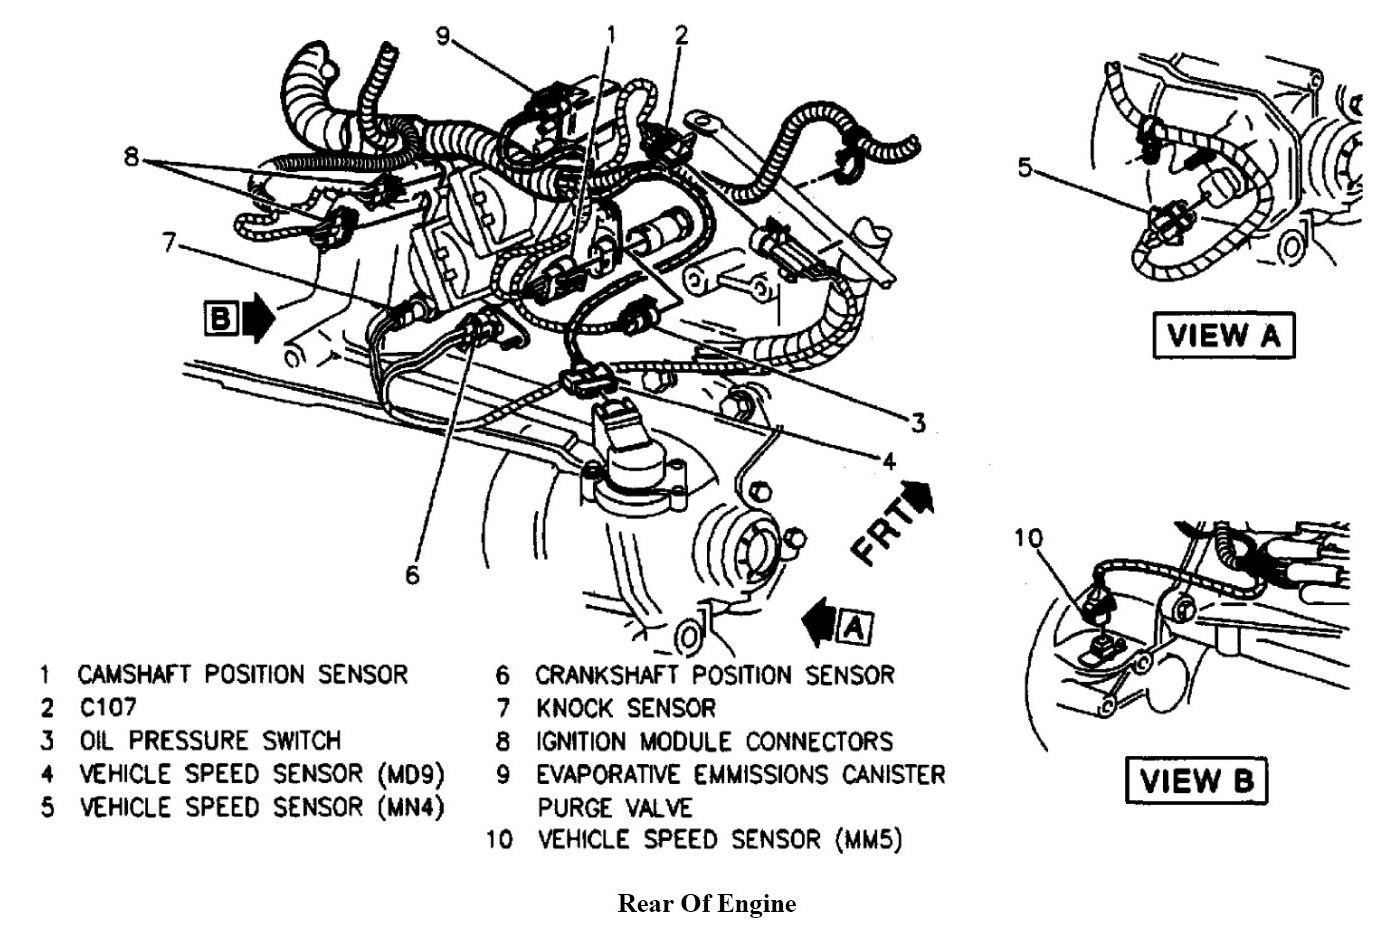 2003 Cavalier Wiring Diagram Of The Pressor Control System